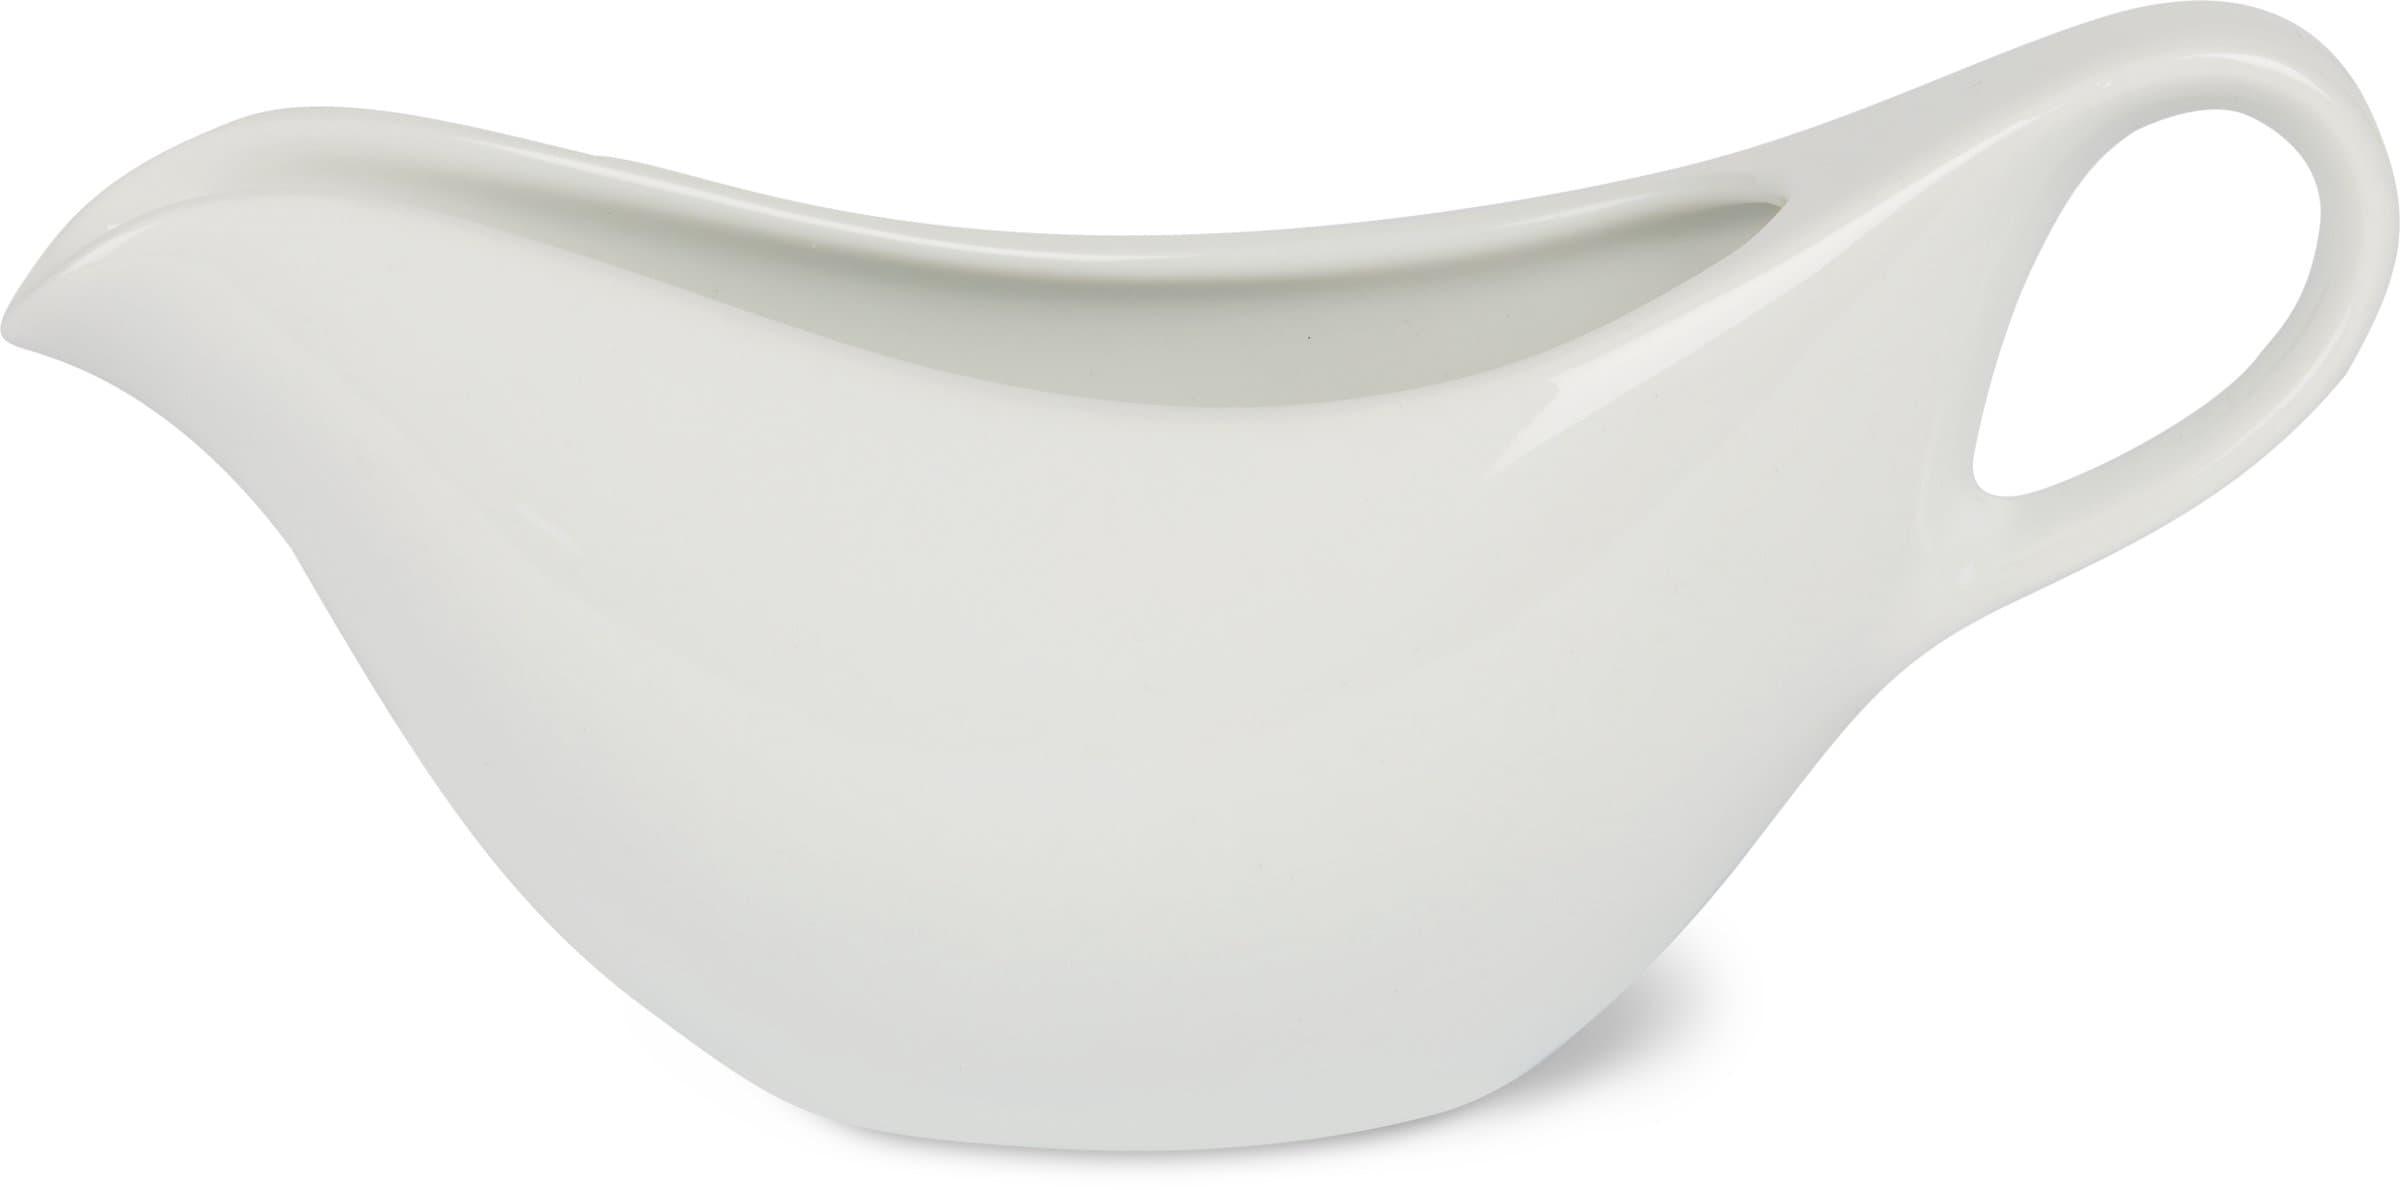 Cucina & Tavola Sauciere 120ml